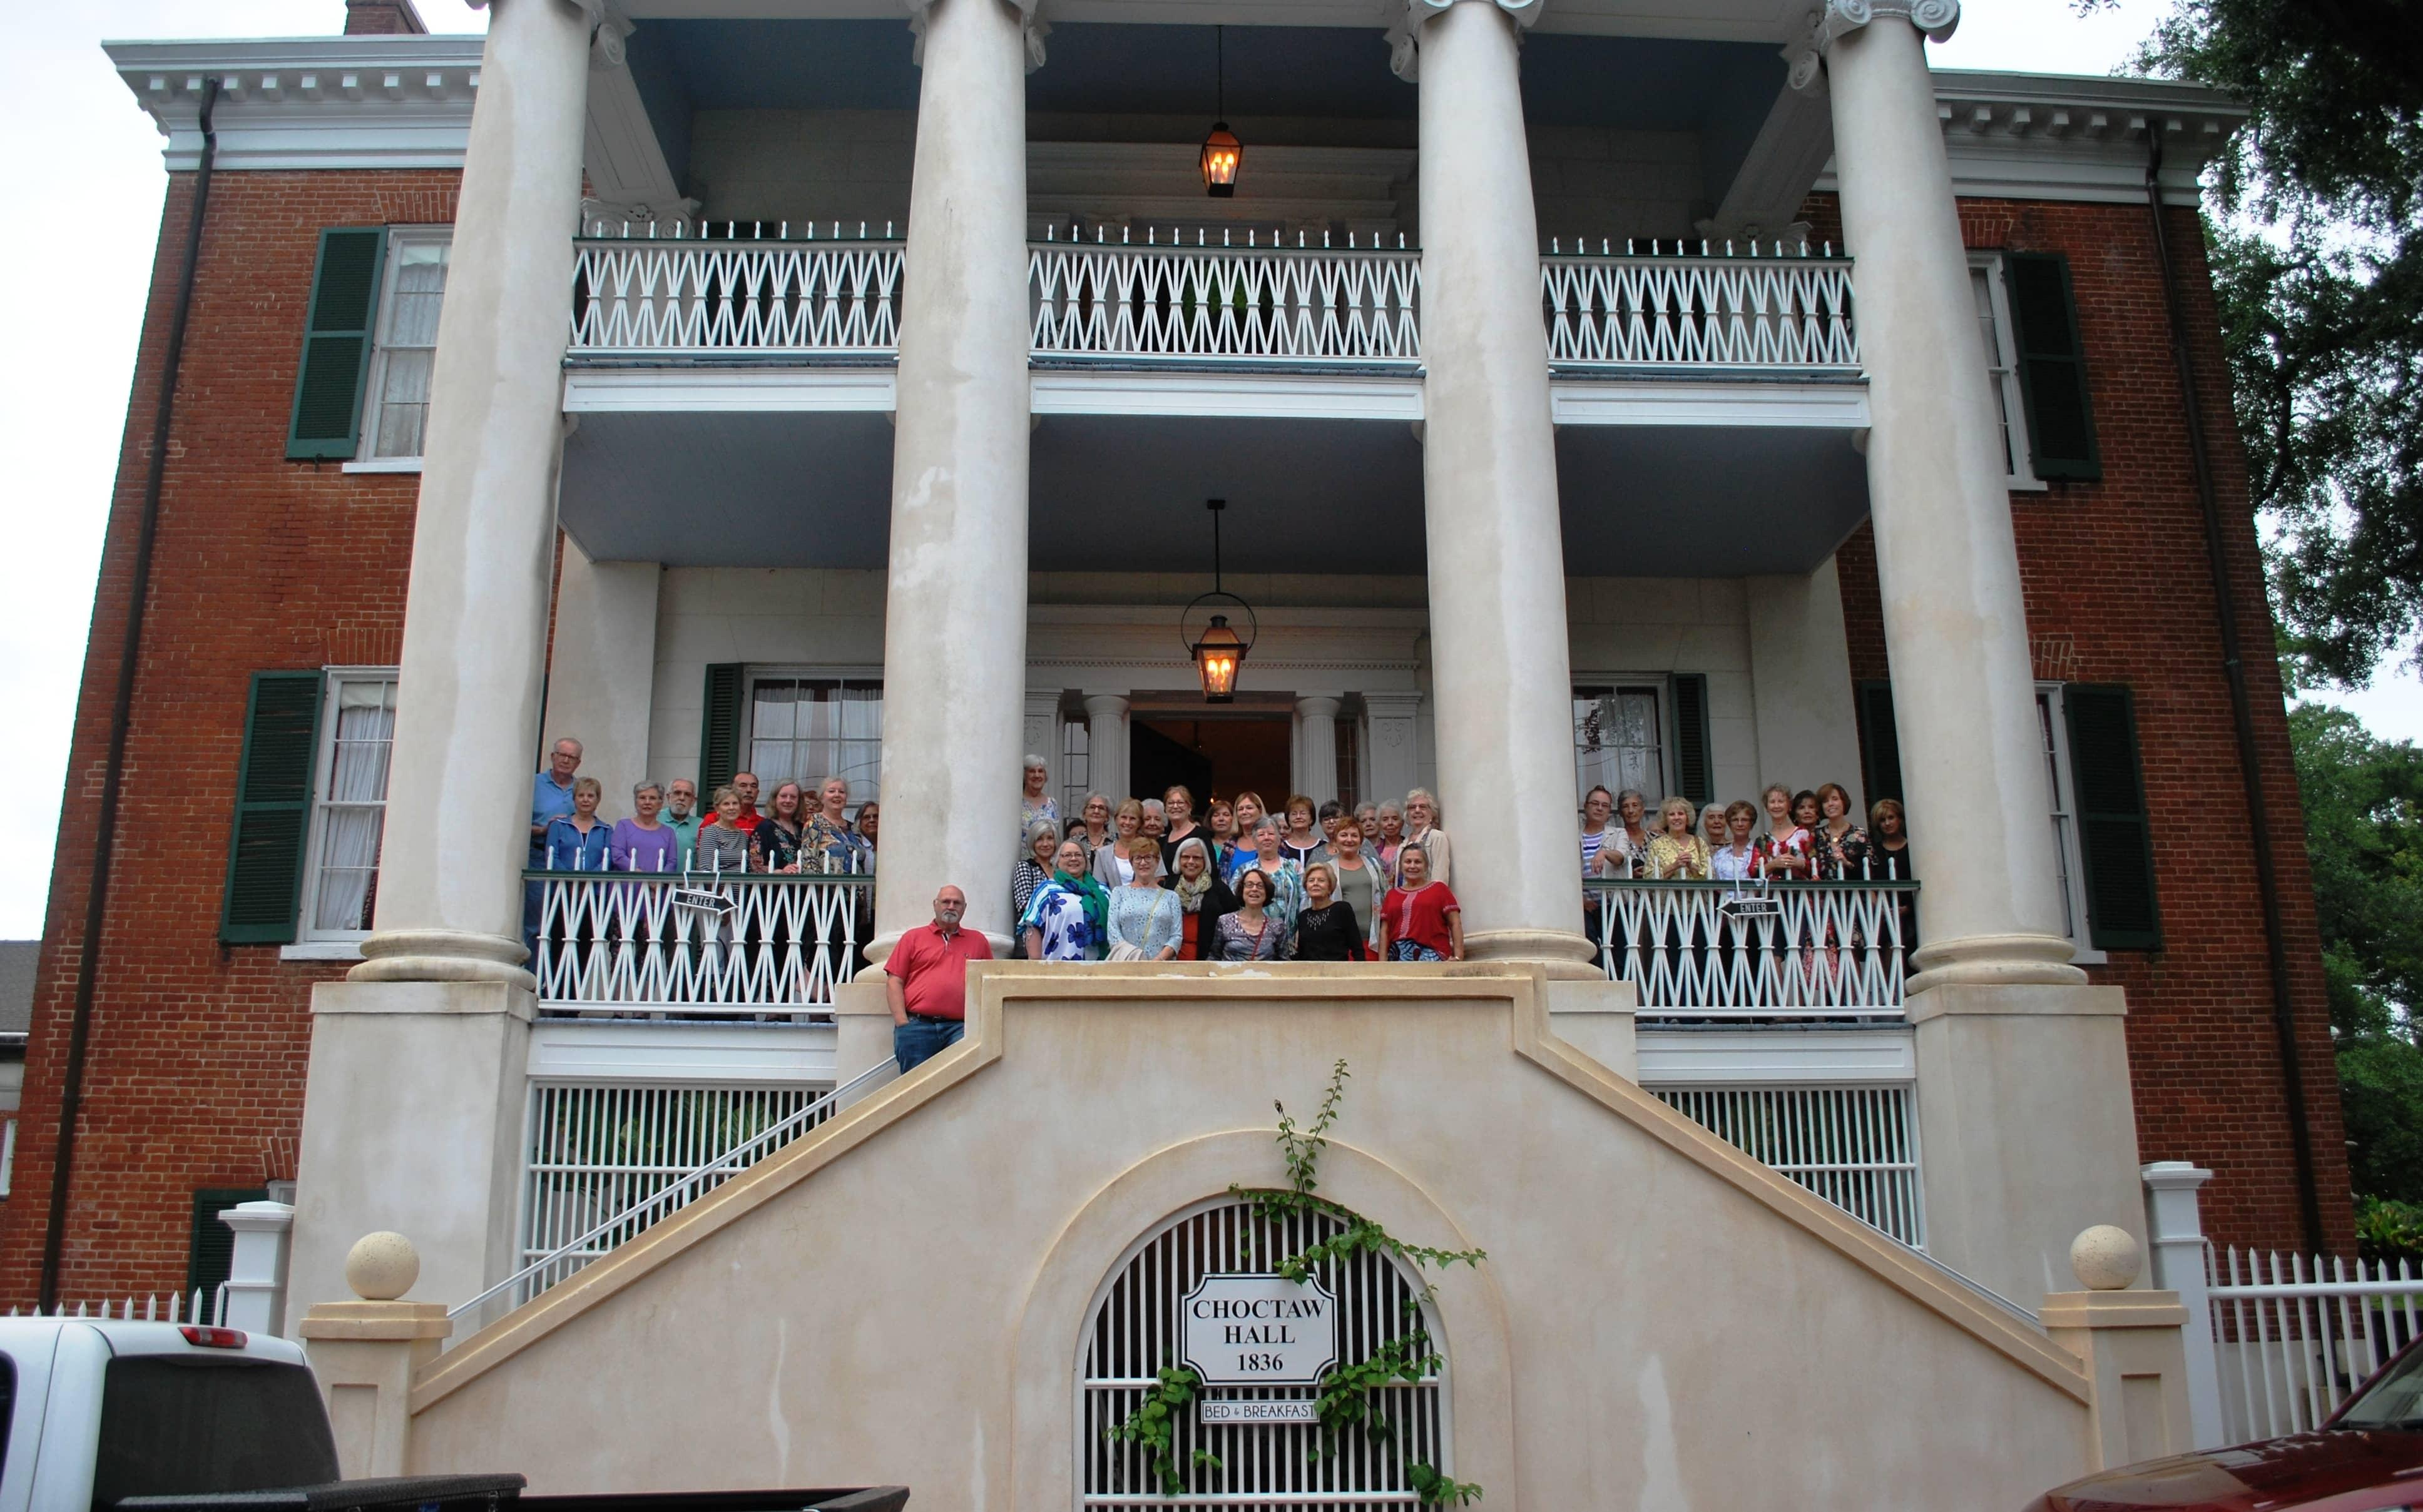 Natchez 3 - Choctaw Hall - Sept 2018.jpg